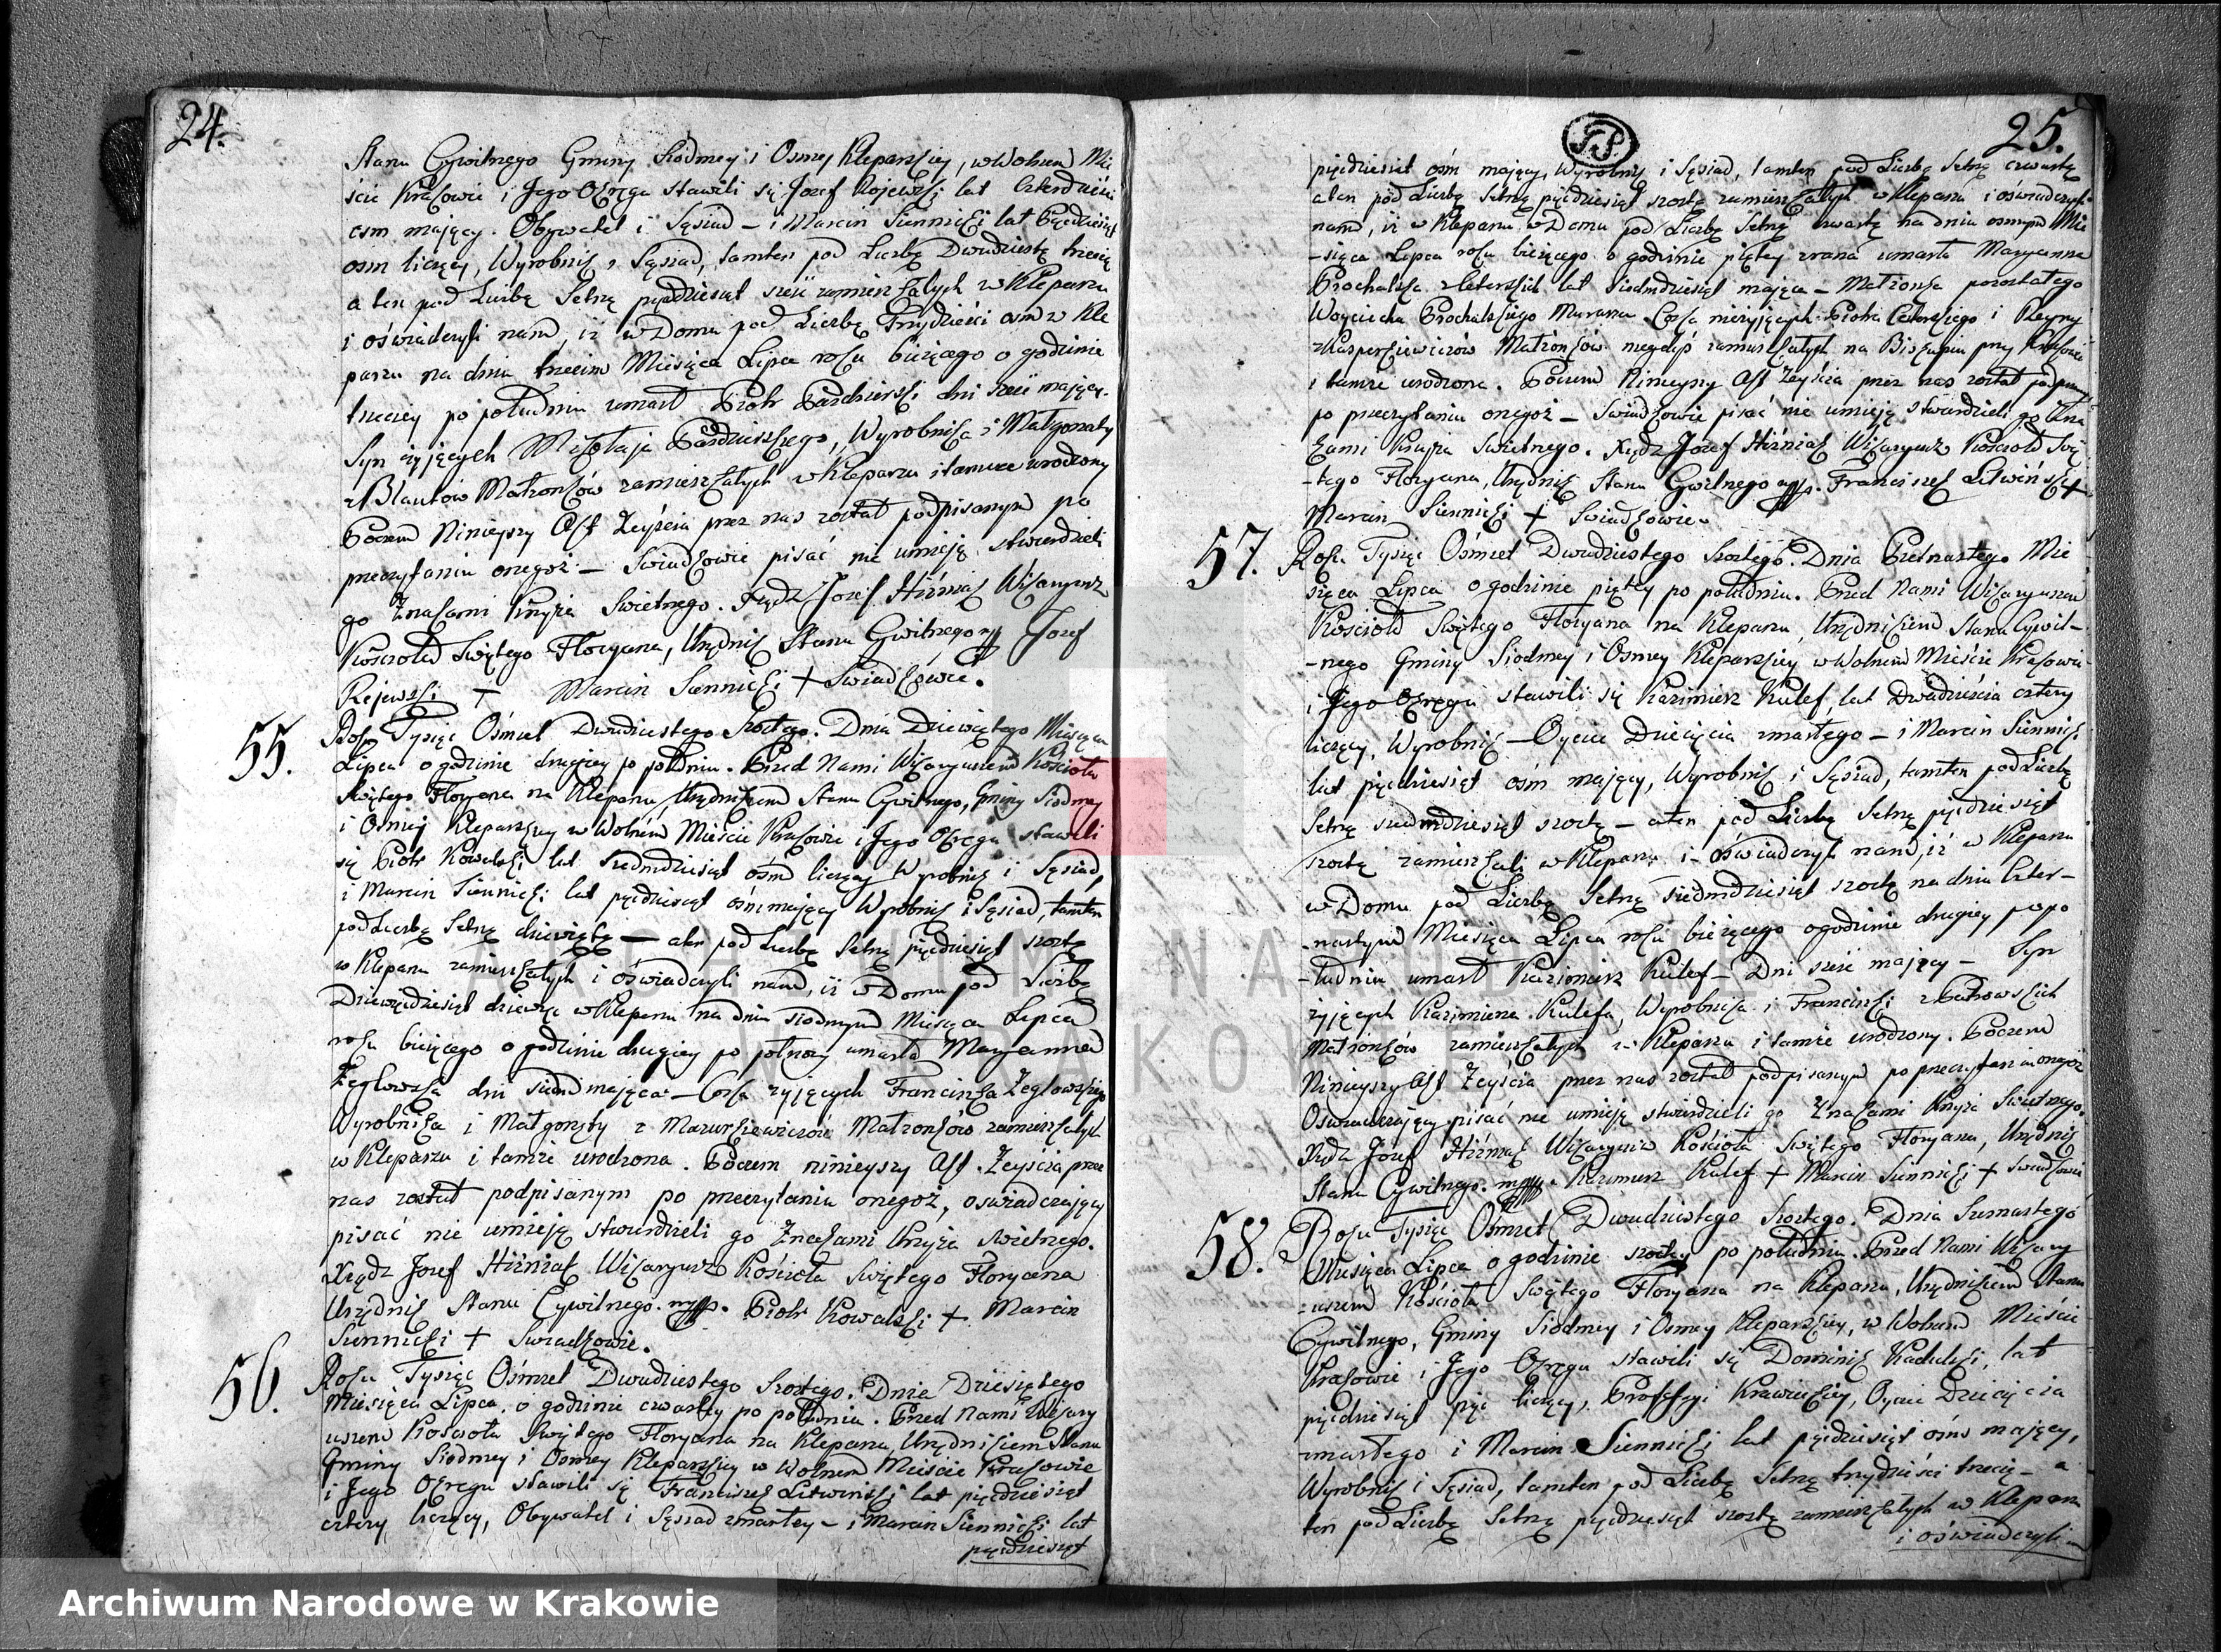 Skan z jednostki: Księga Aktów Zeyścia Parafii Sgo Floryana na Rok 1826ty